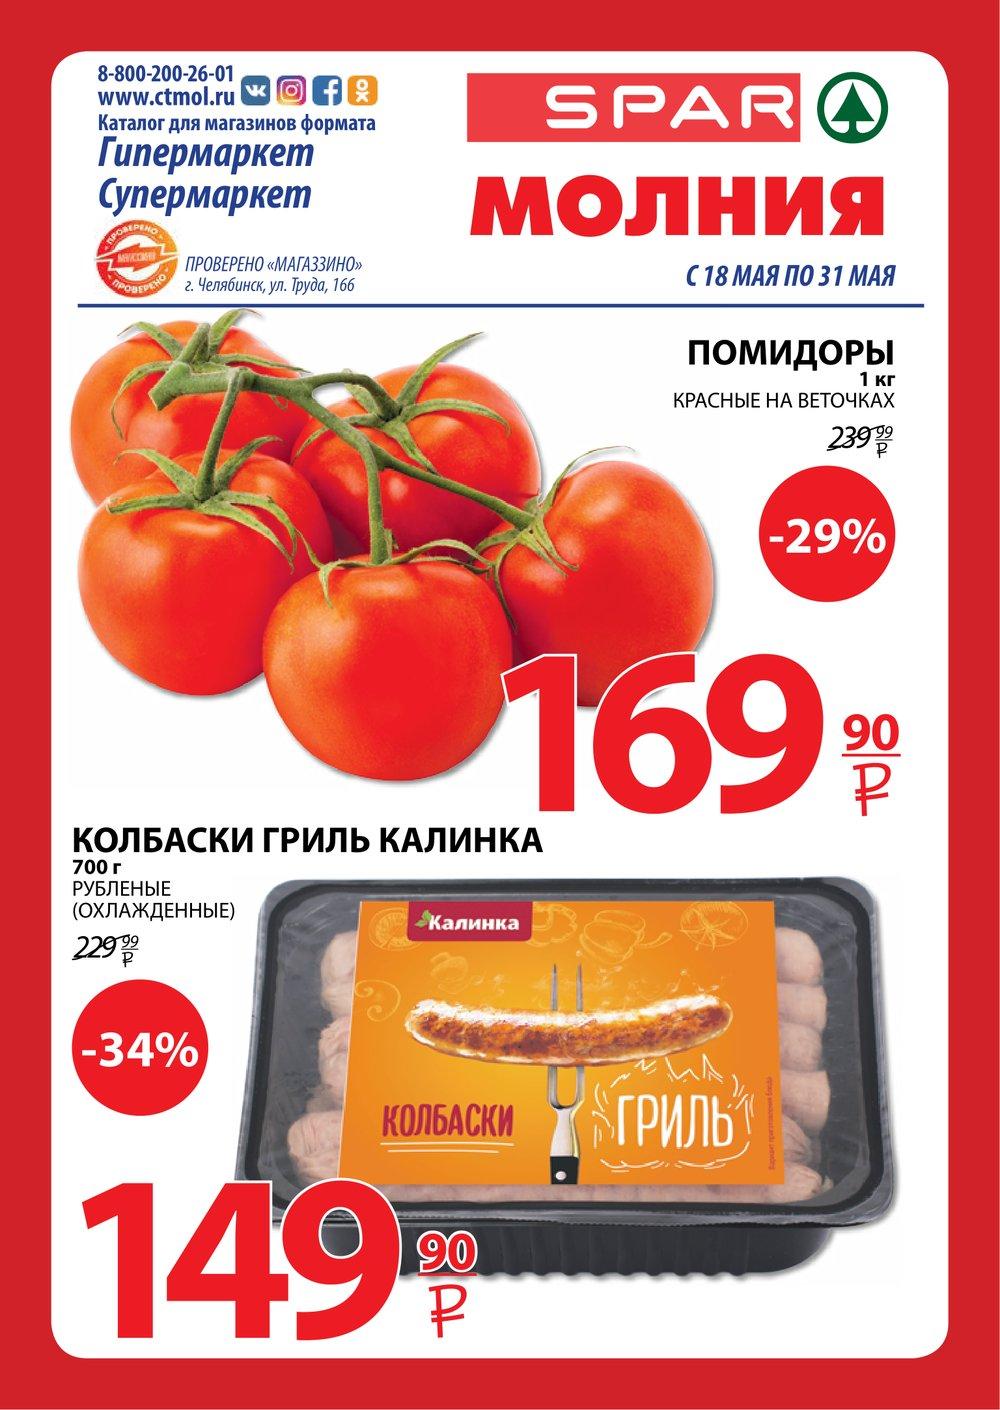 Каталог акций Spar с 18 по 31 мая 2017 - стр. 1